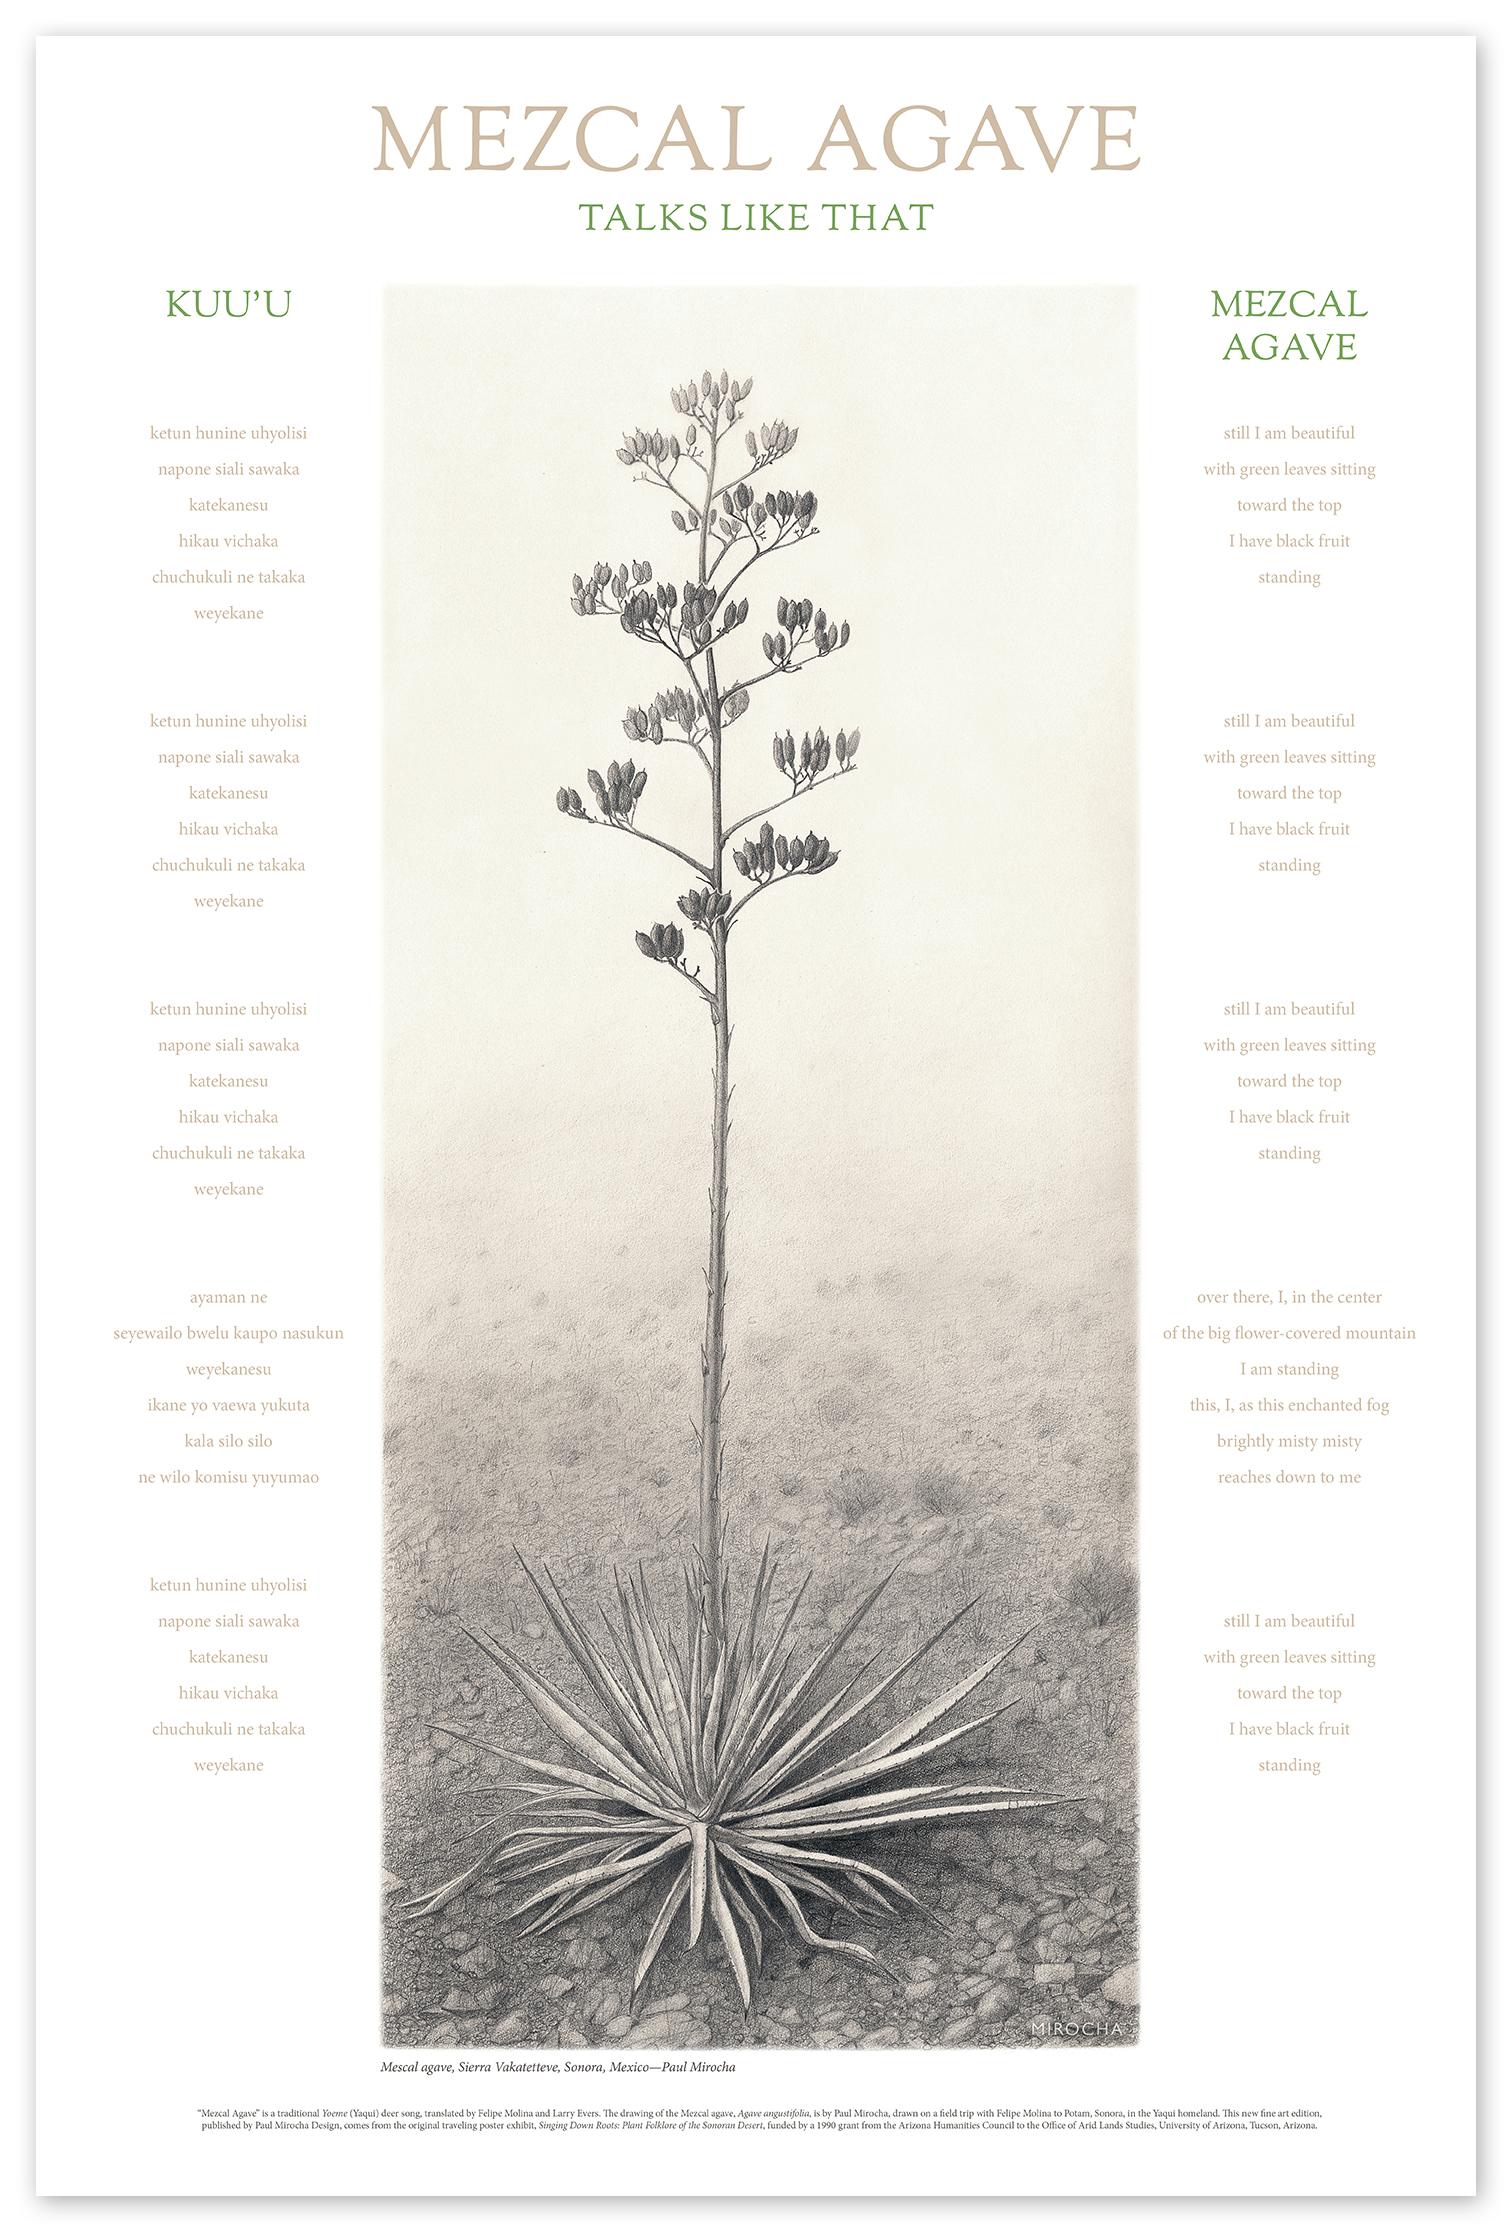 Mezcal agave